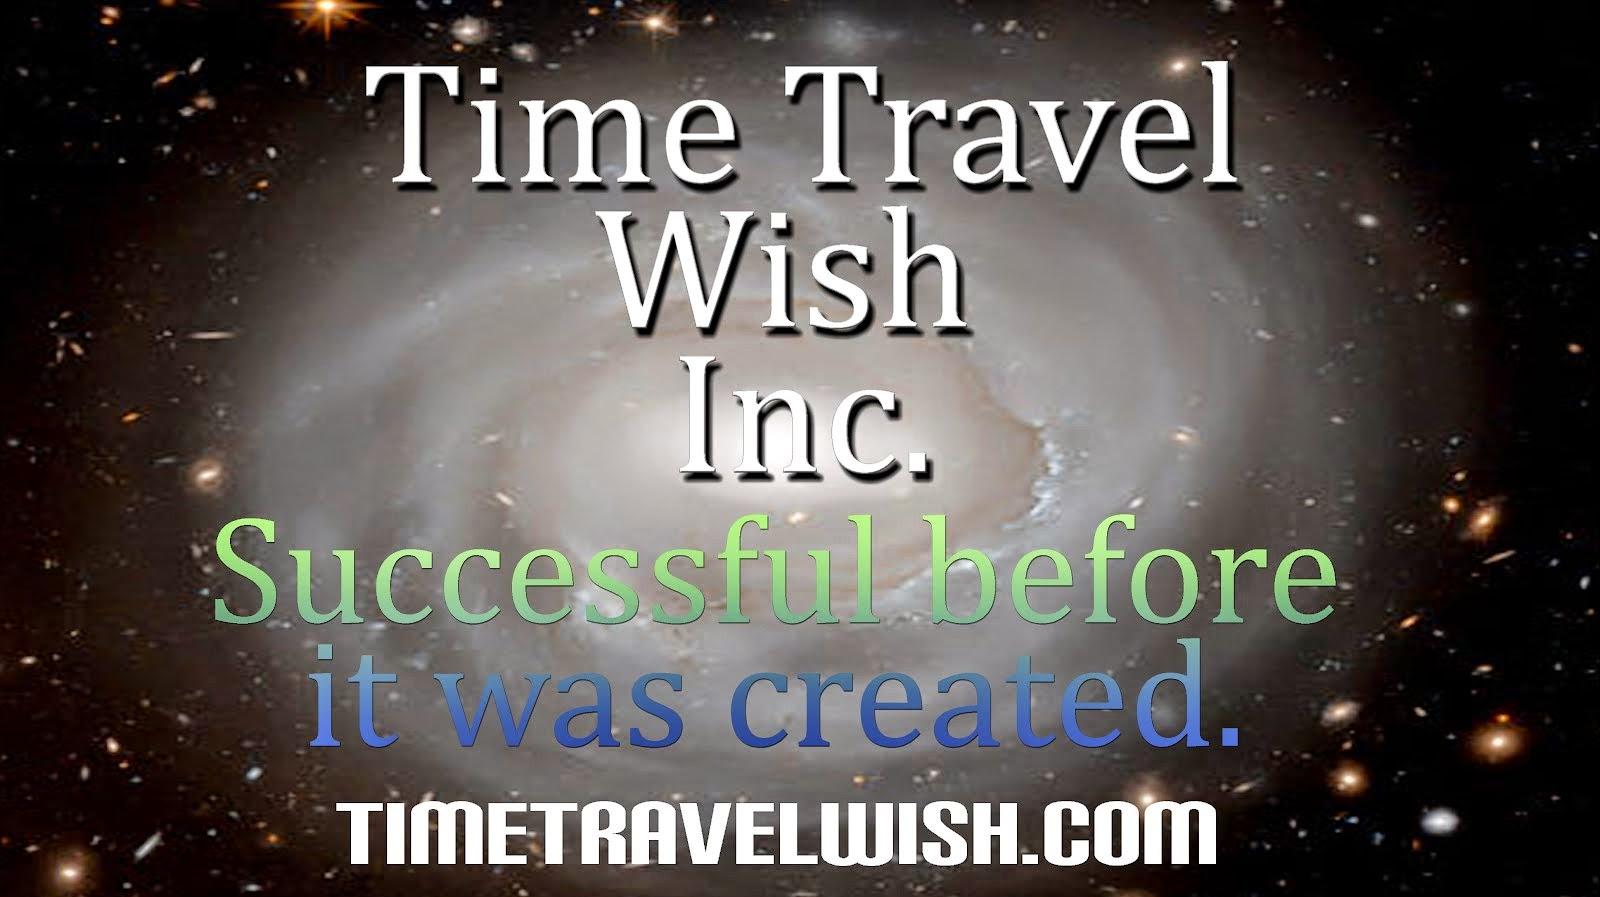 Time Travel Wish Inc.